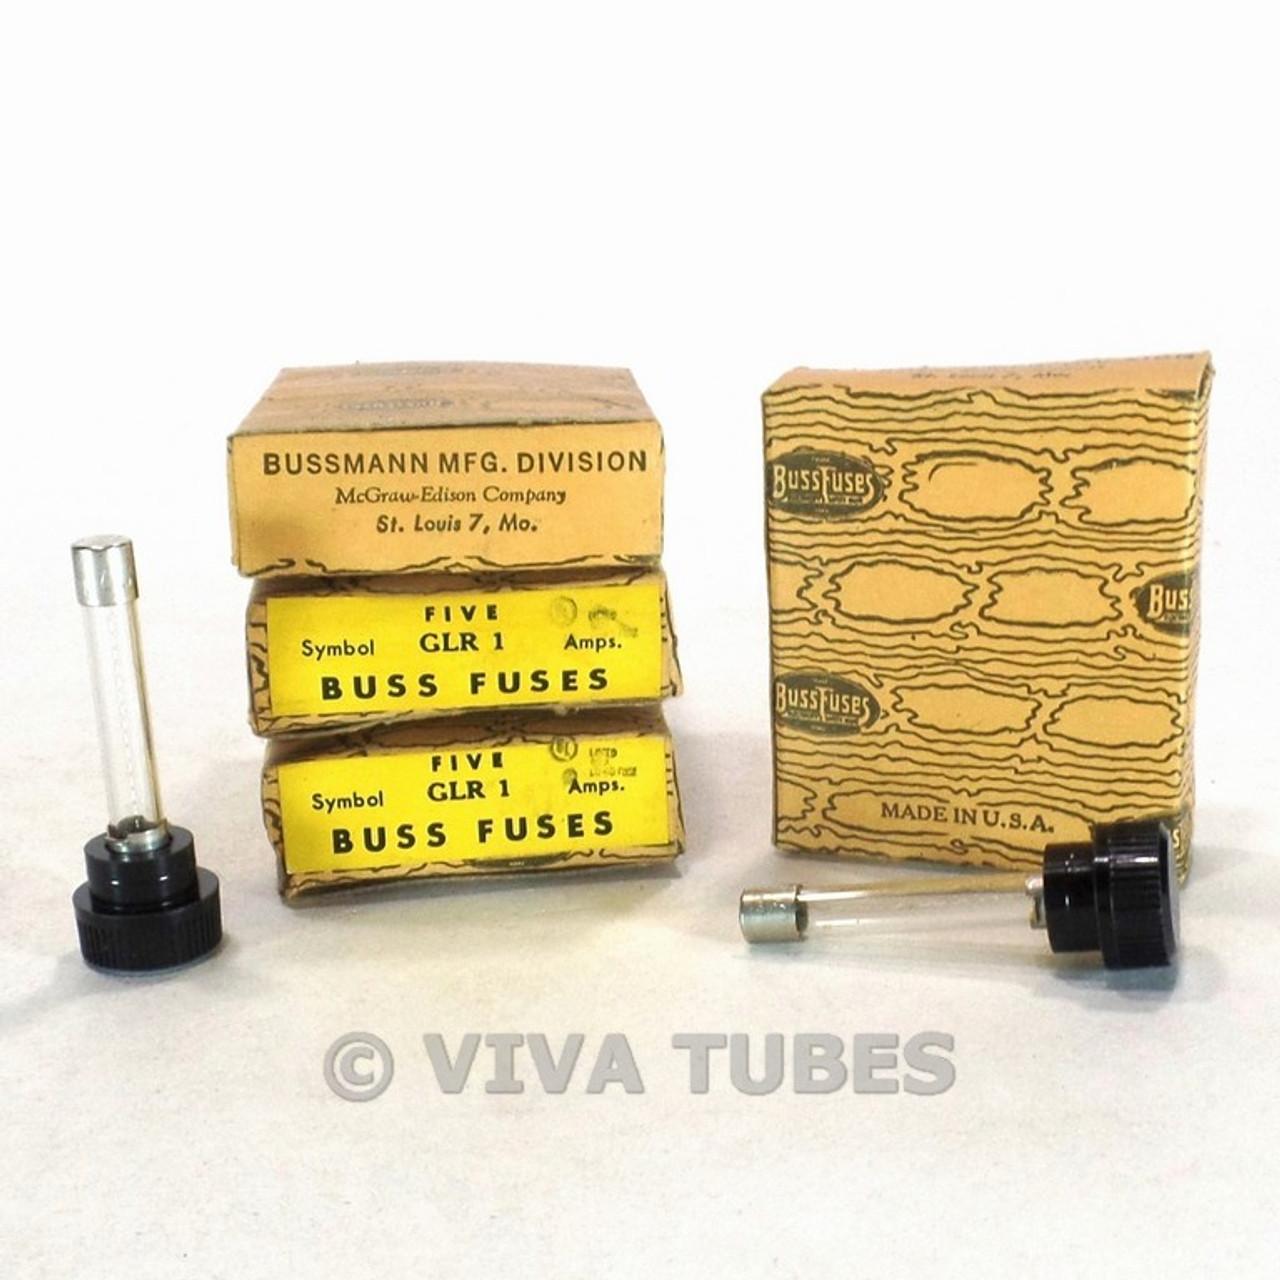 small resolution of lot of 20 nos nib bussman fuses glr 1 a 300 v panel mount fuse holder tube amps viva tubes